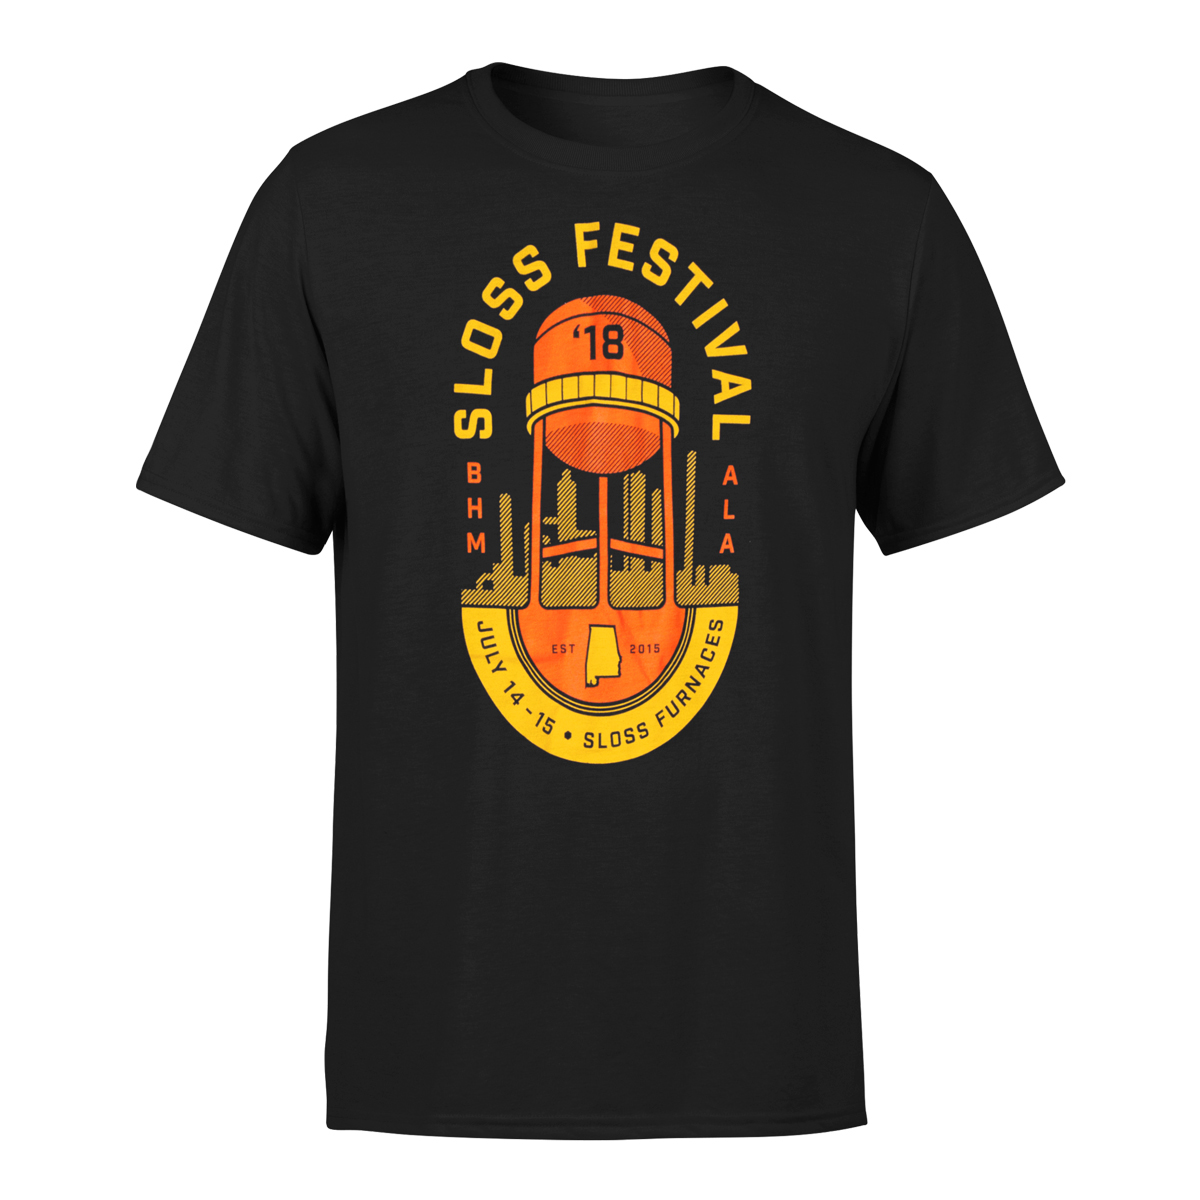 Sloss Music & Arts Festival 2018 Water Tower Emblem Event Tee